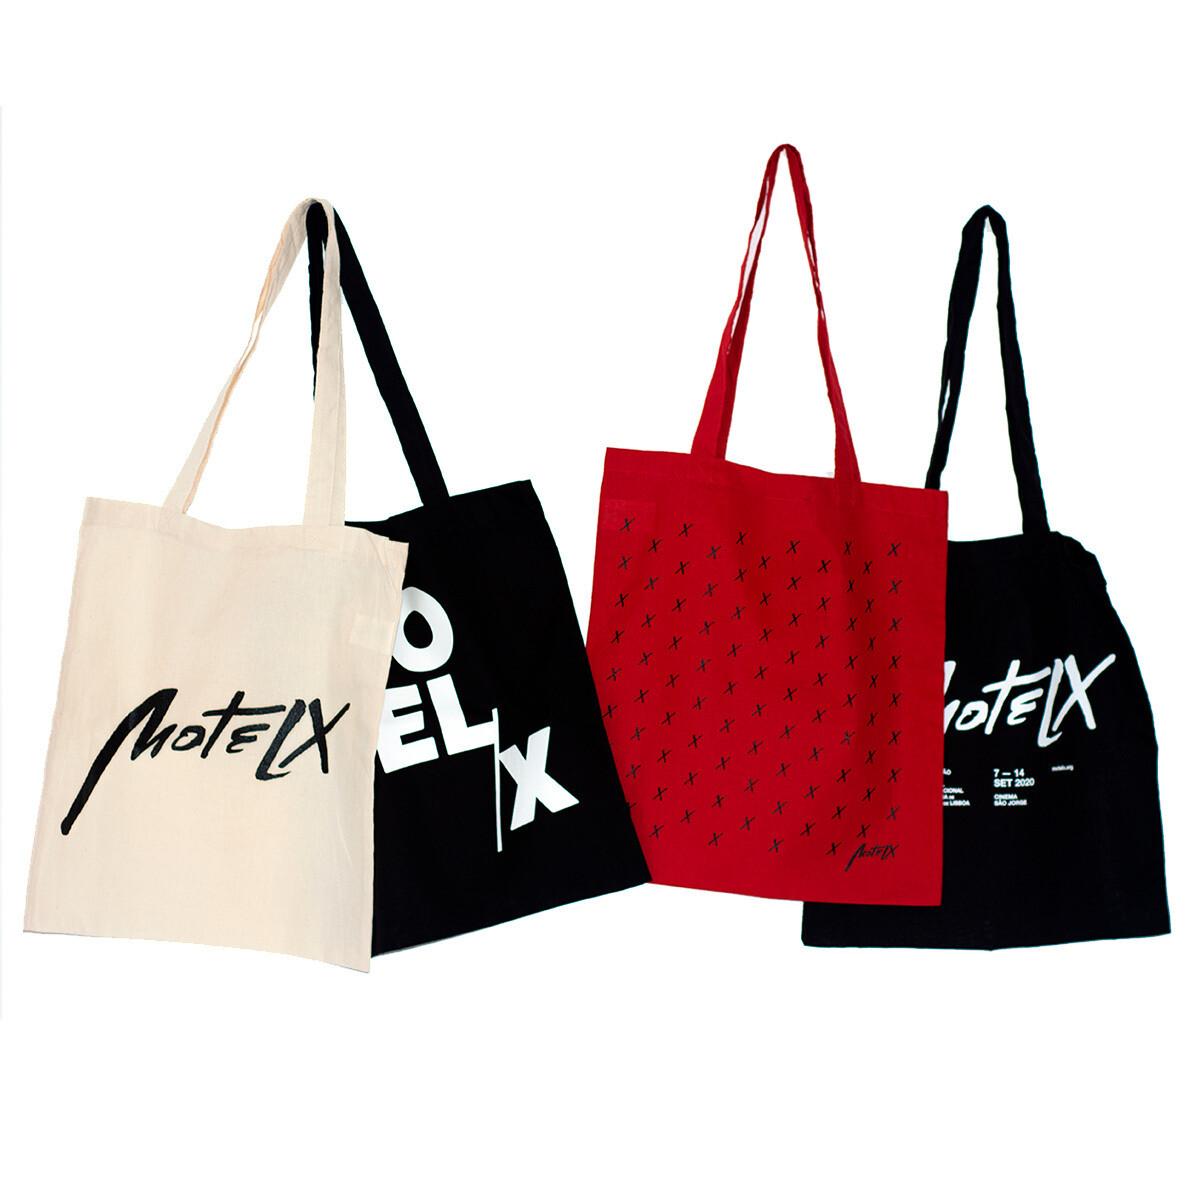 MOTELX Tote Bags